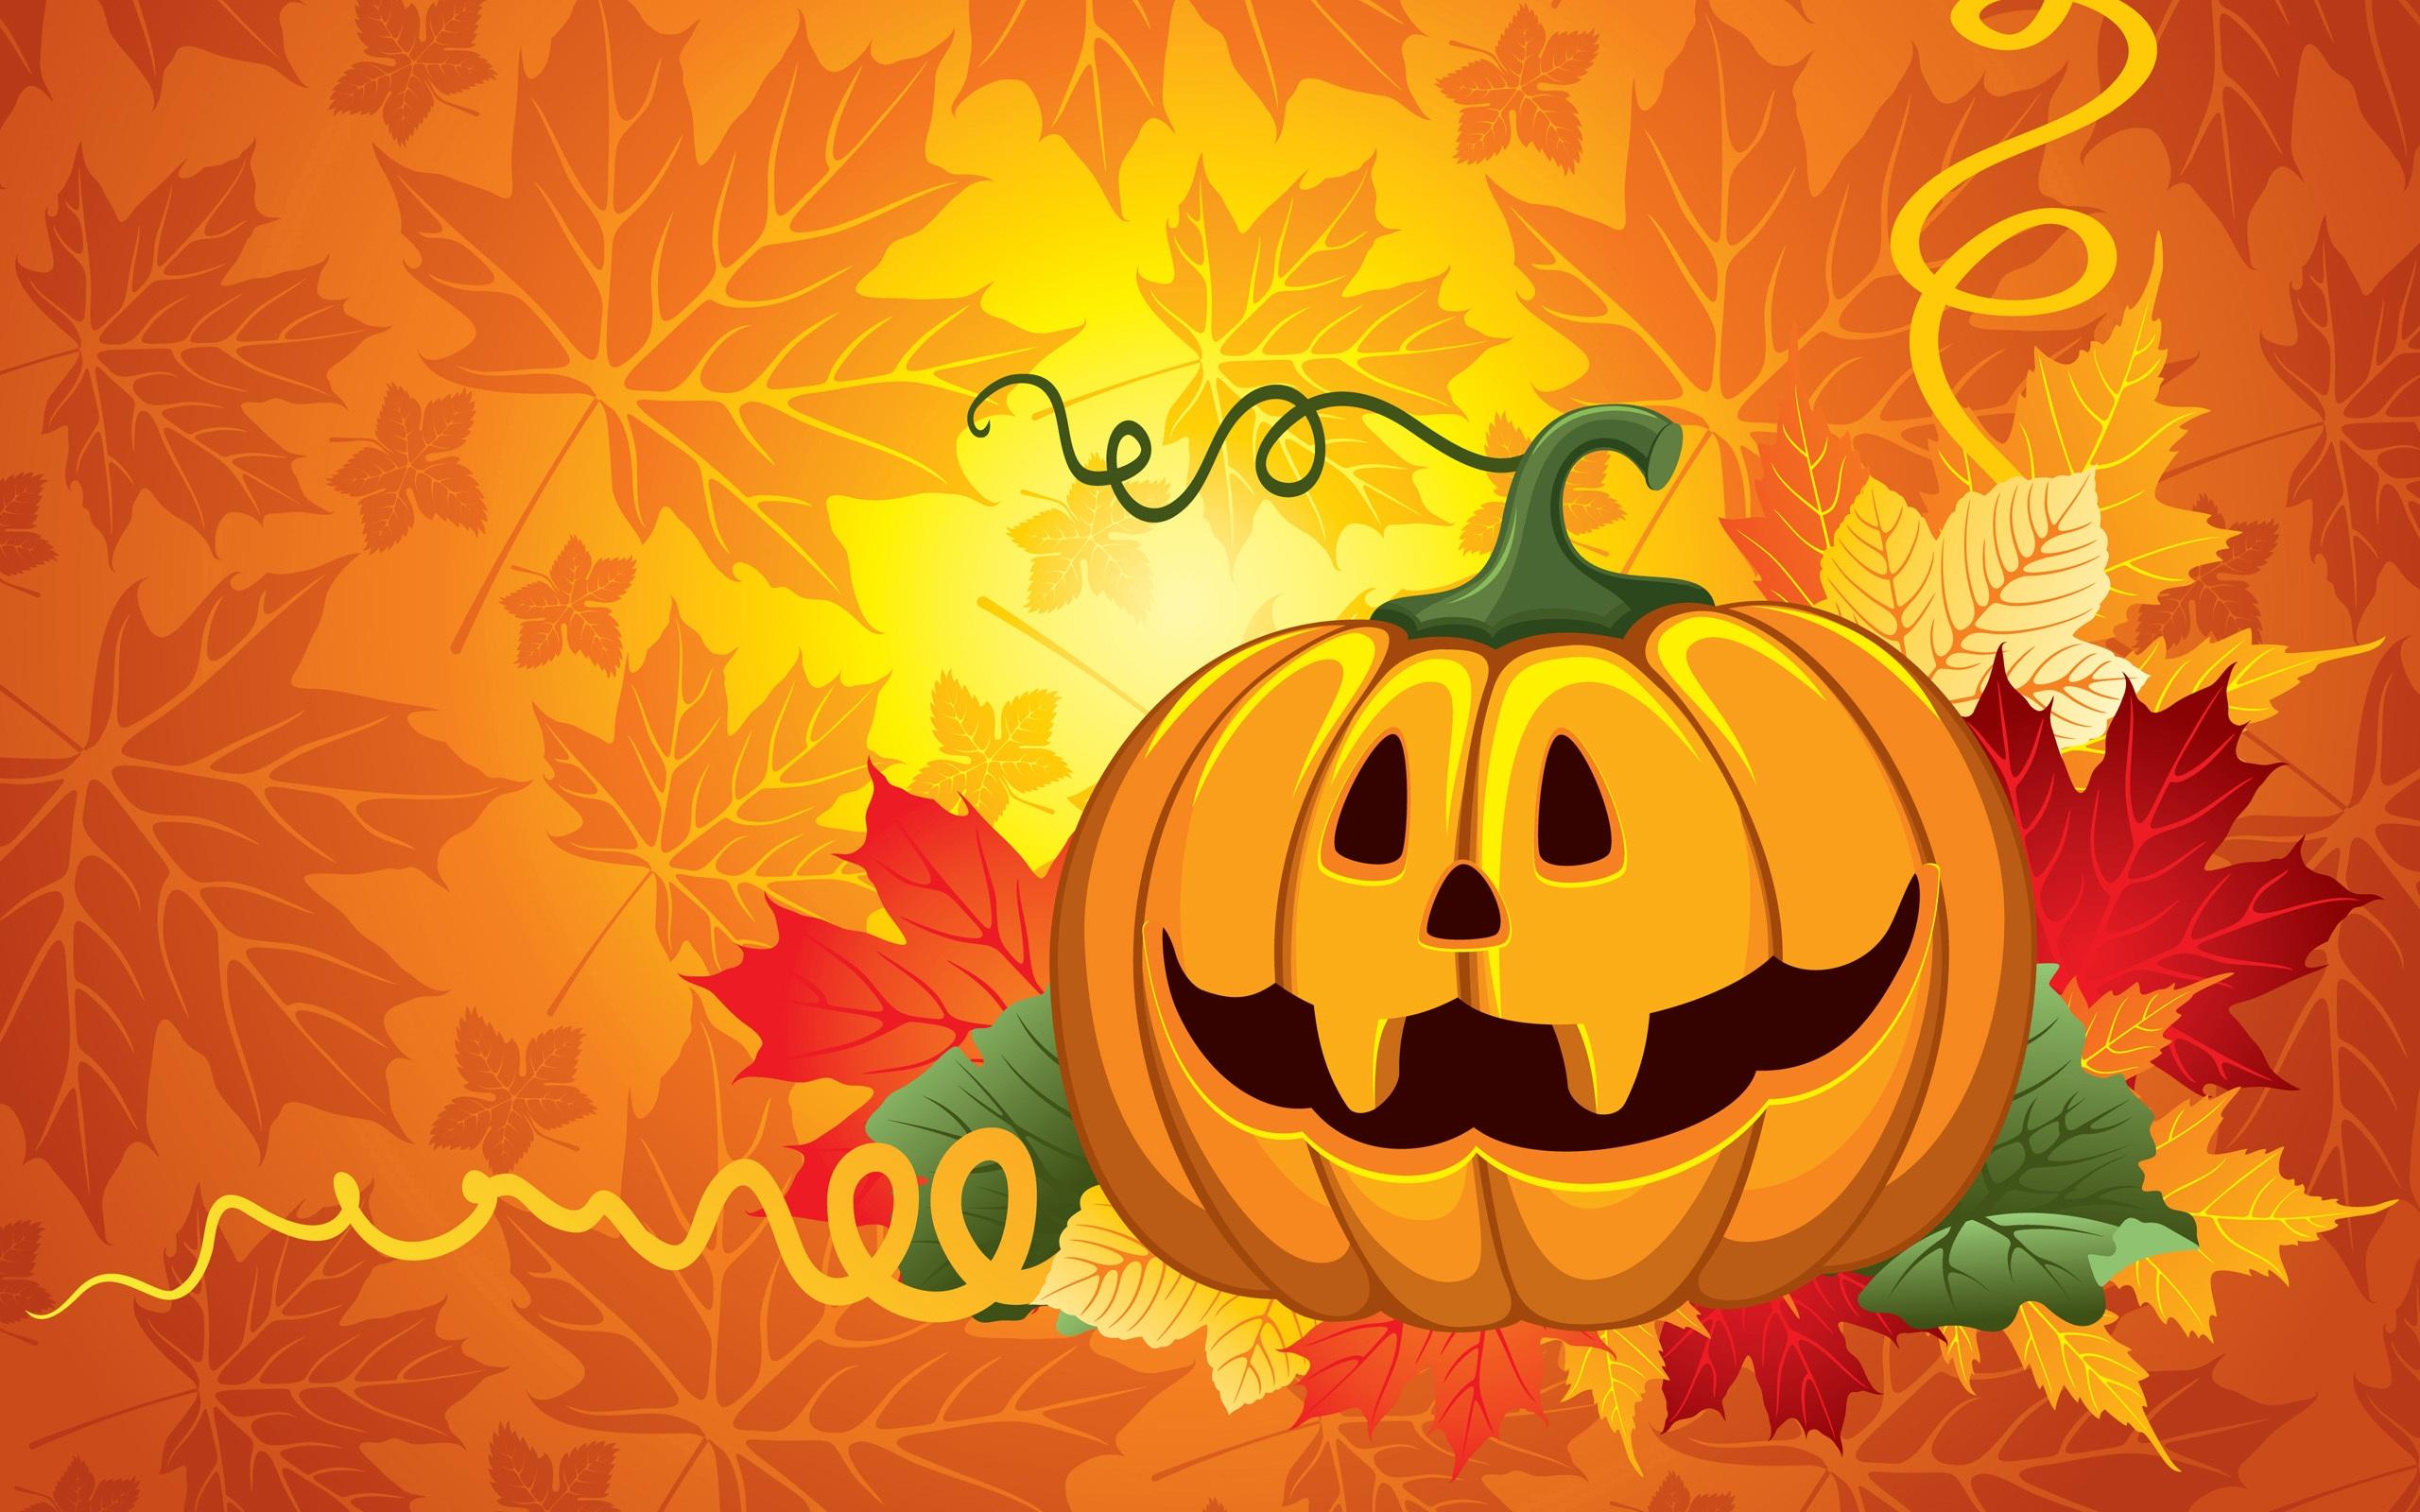 fondos halloween wallpapers gratis - photo #19